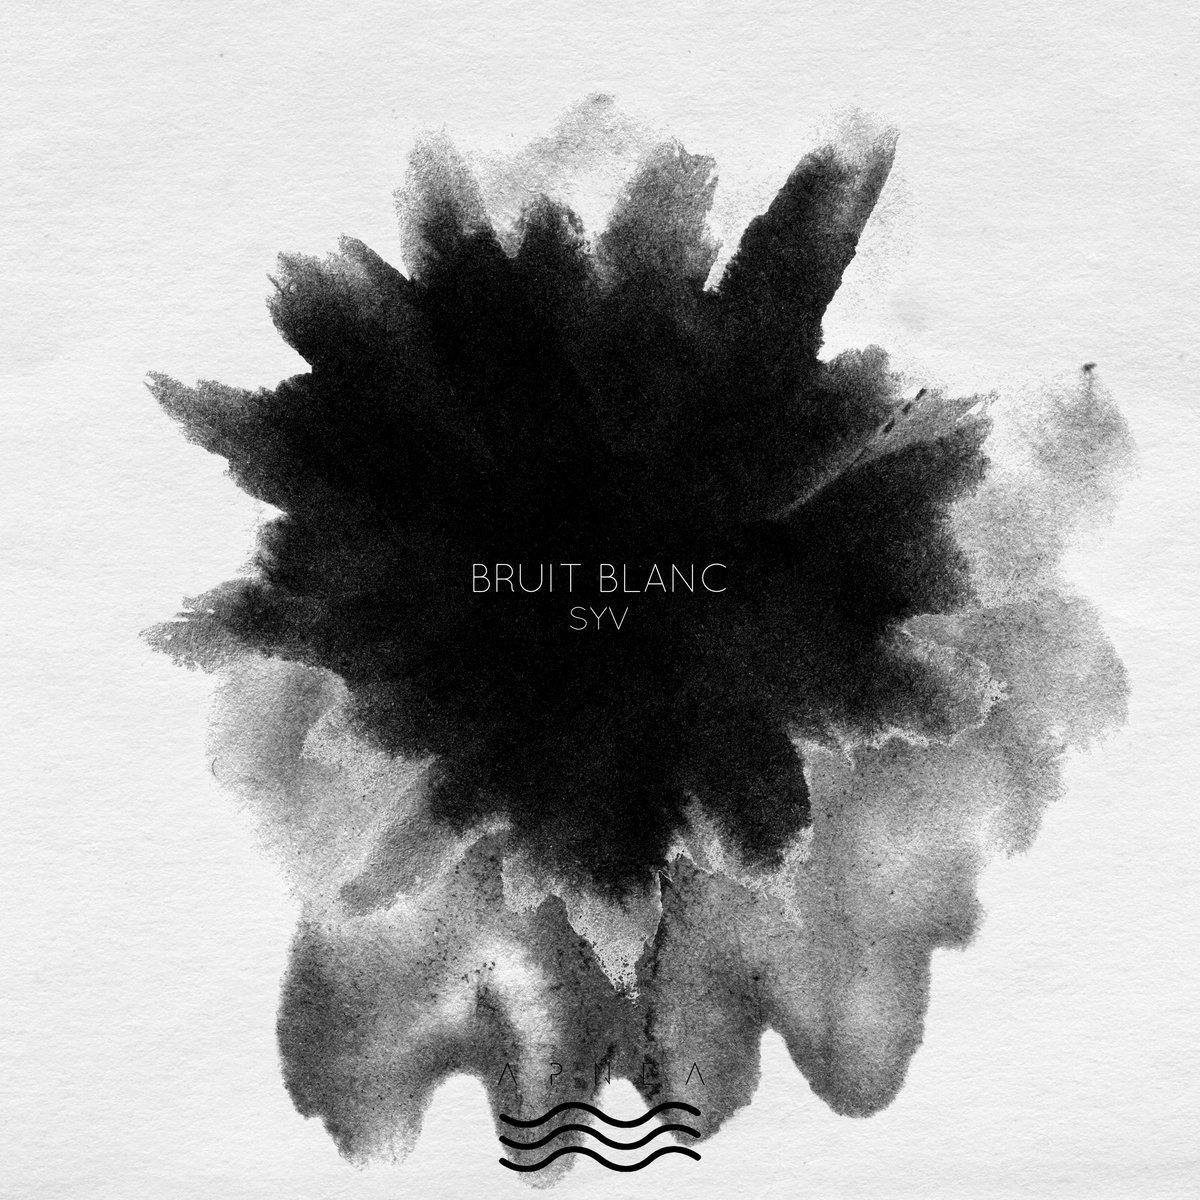 Bruit Blanc Syv